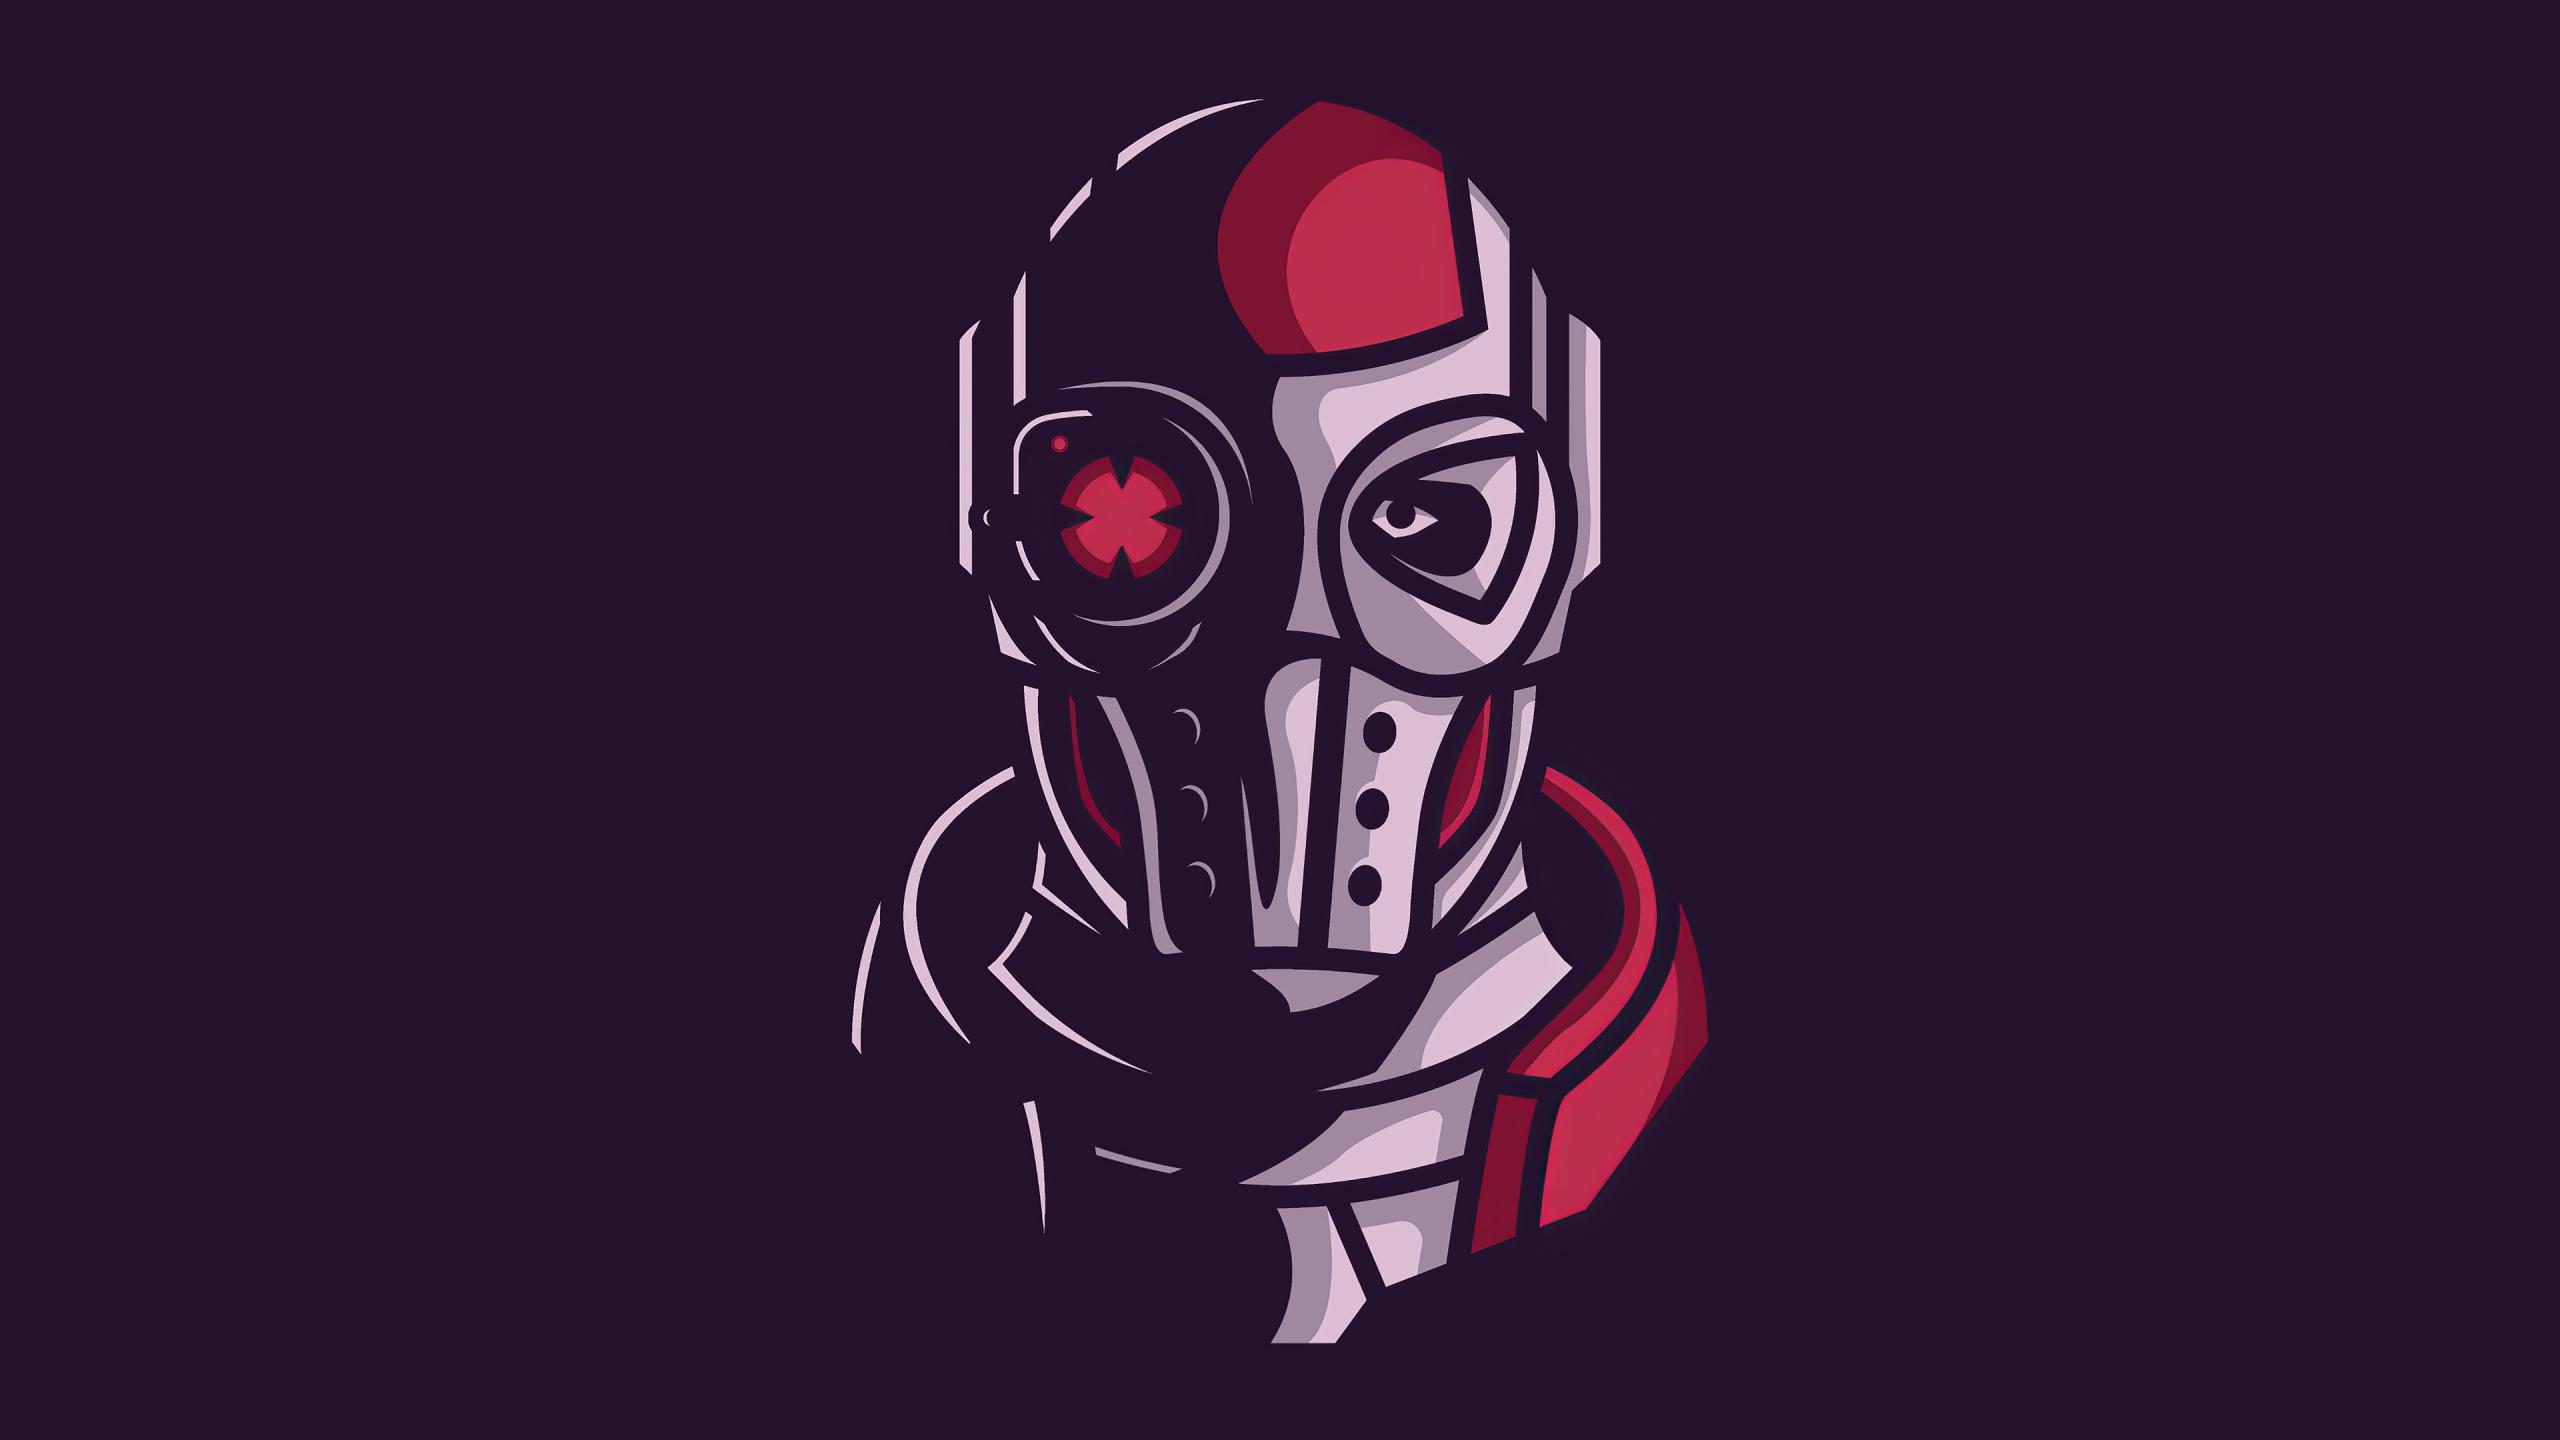 2560x1440 Deadshot Face Minimal 1440p Resolution Wallpaper